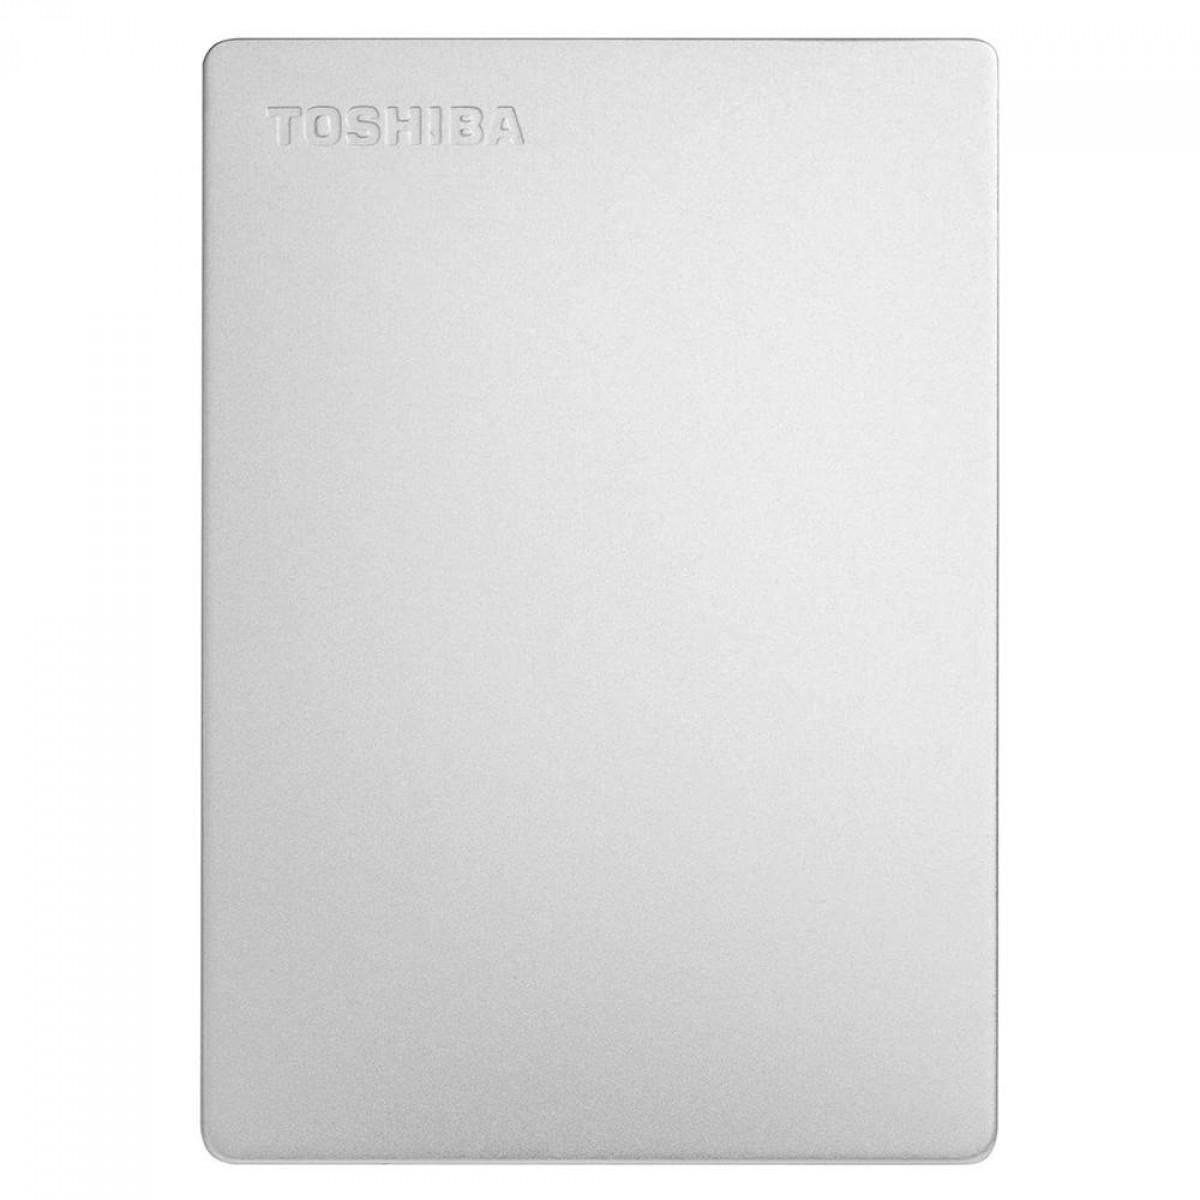 HD Externo Toshiba Canvio Slim 2TB, USB 3.0, Silver, Até 5Gb/s, HDTD320XS3EA